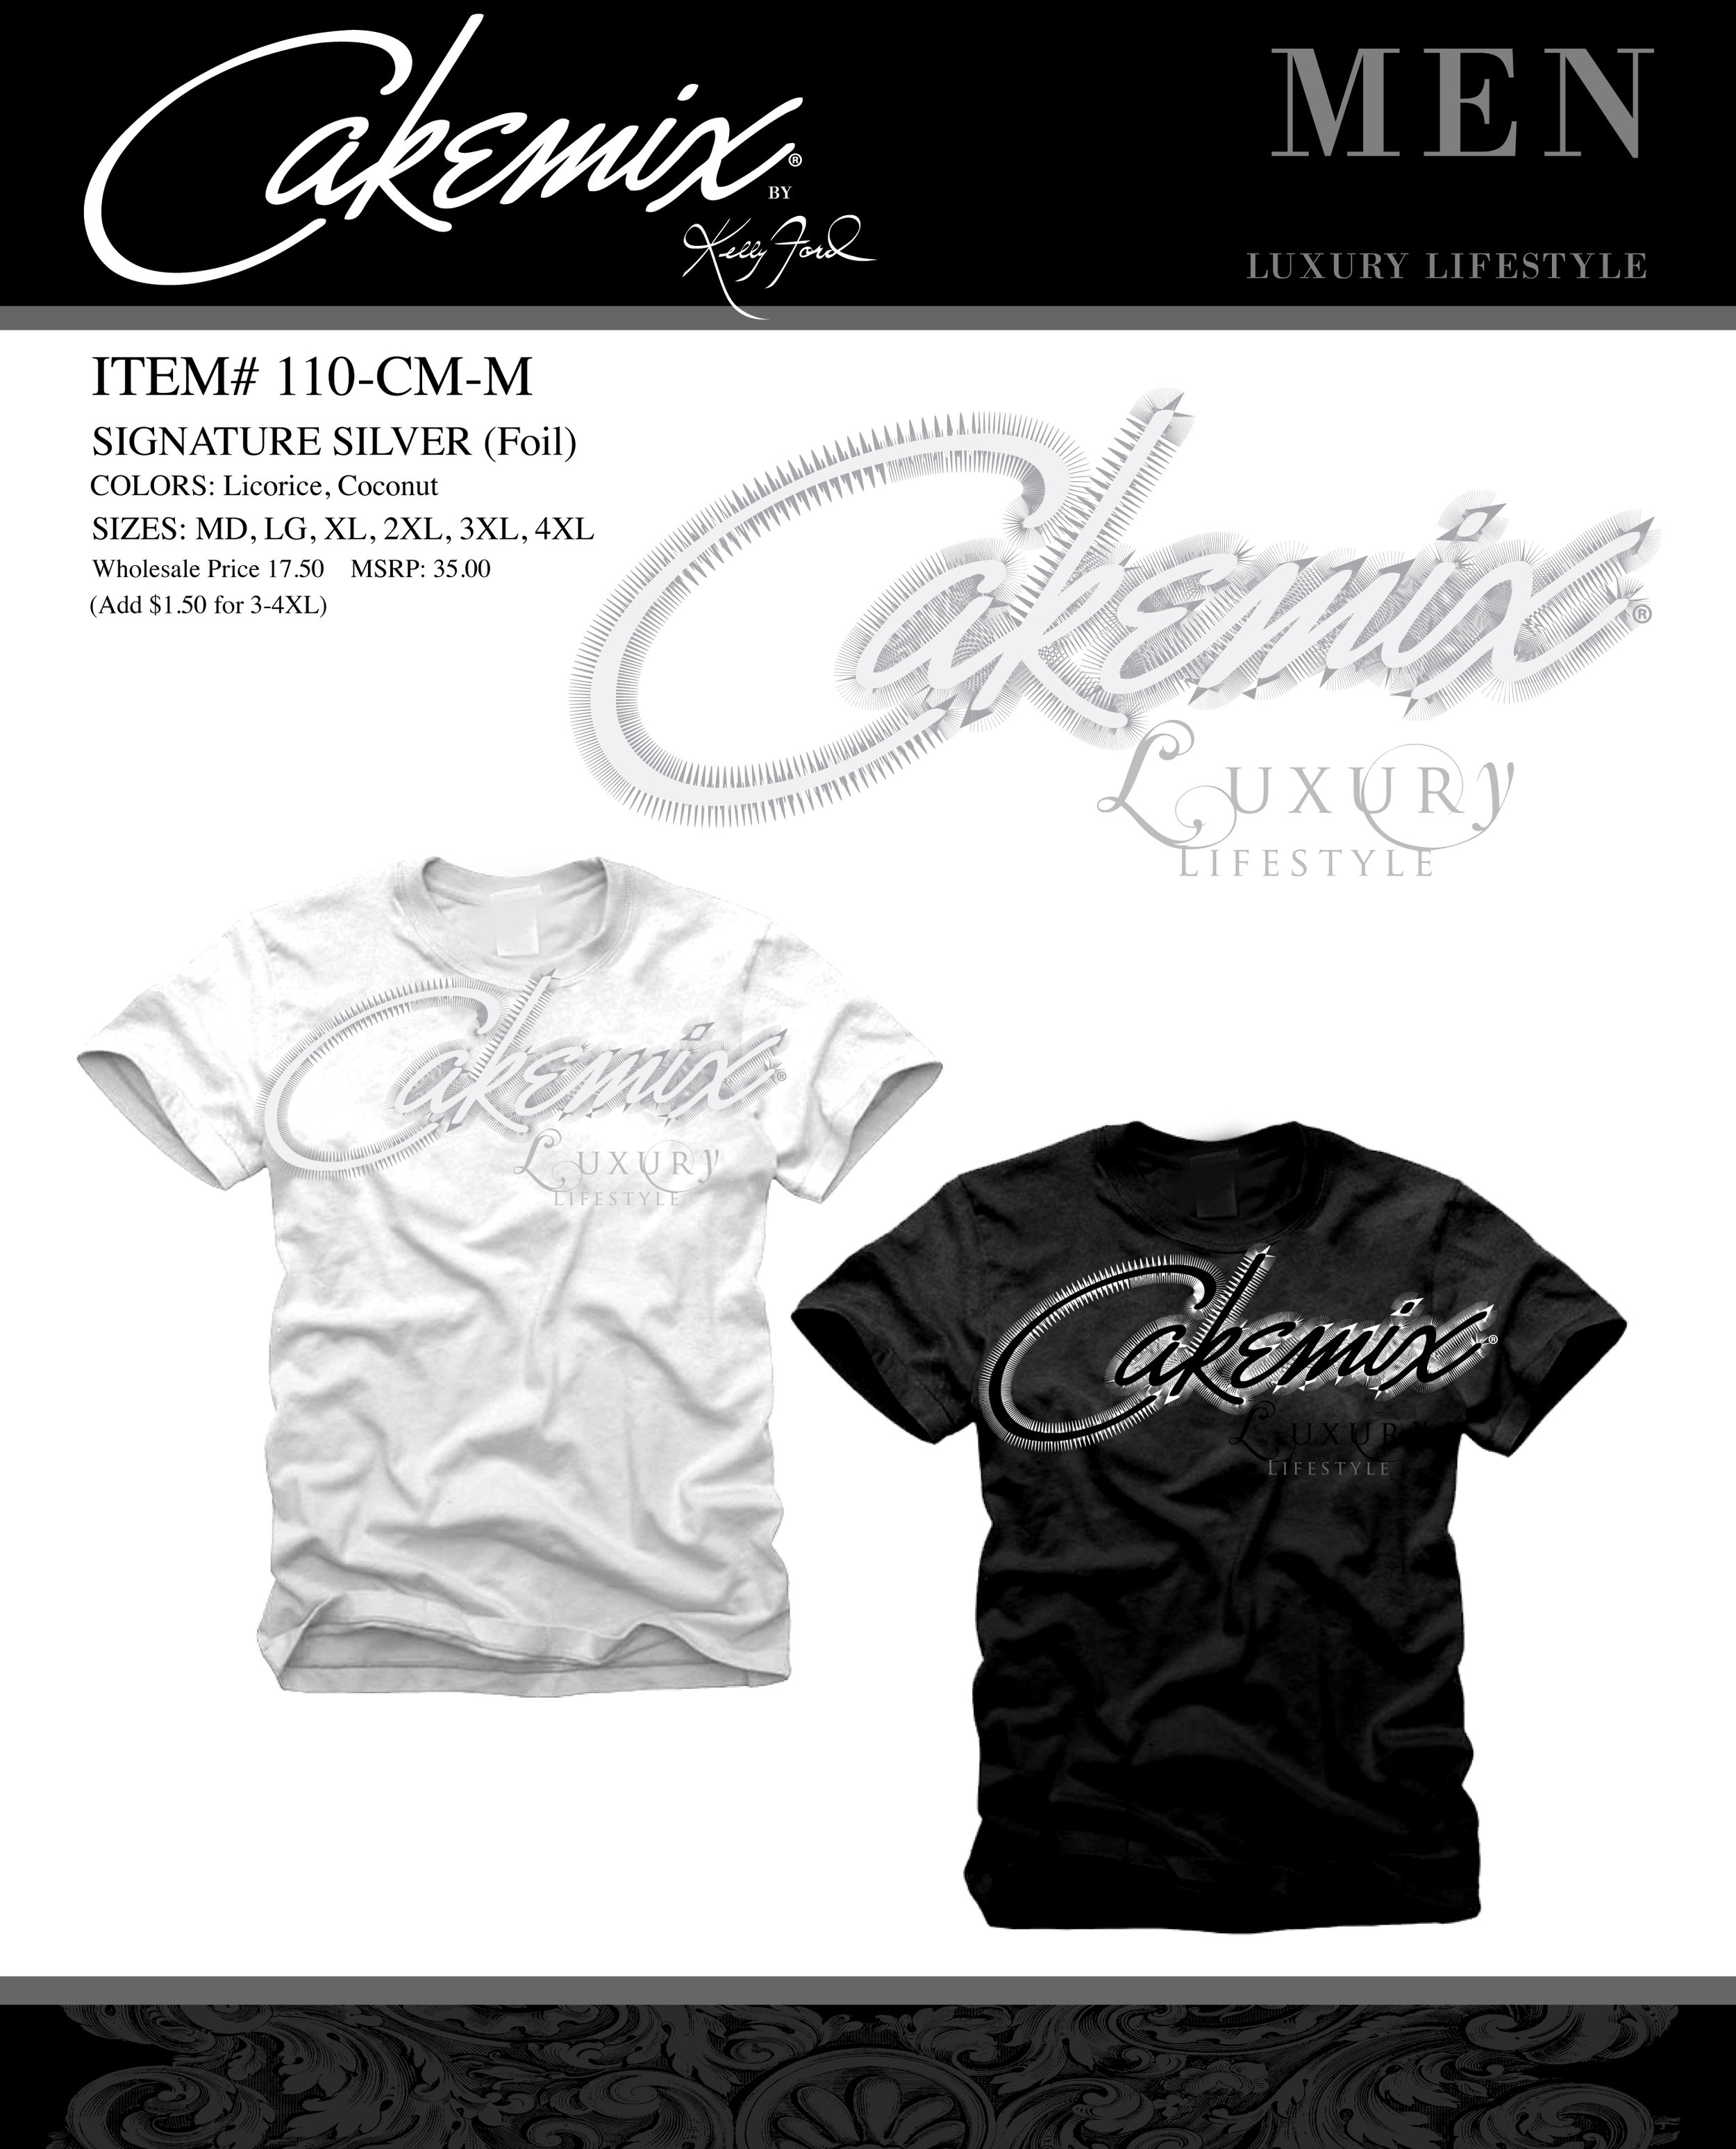 21-Cakemix-Signature Silver-110-CM-M.jpg